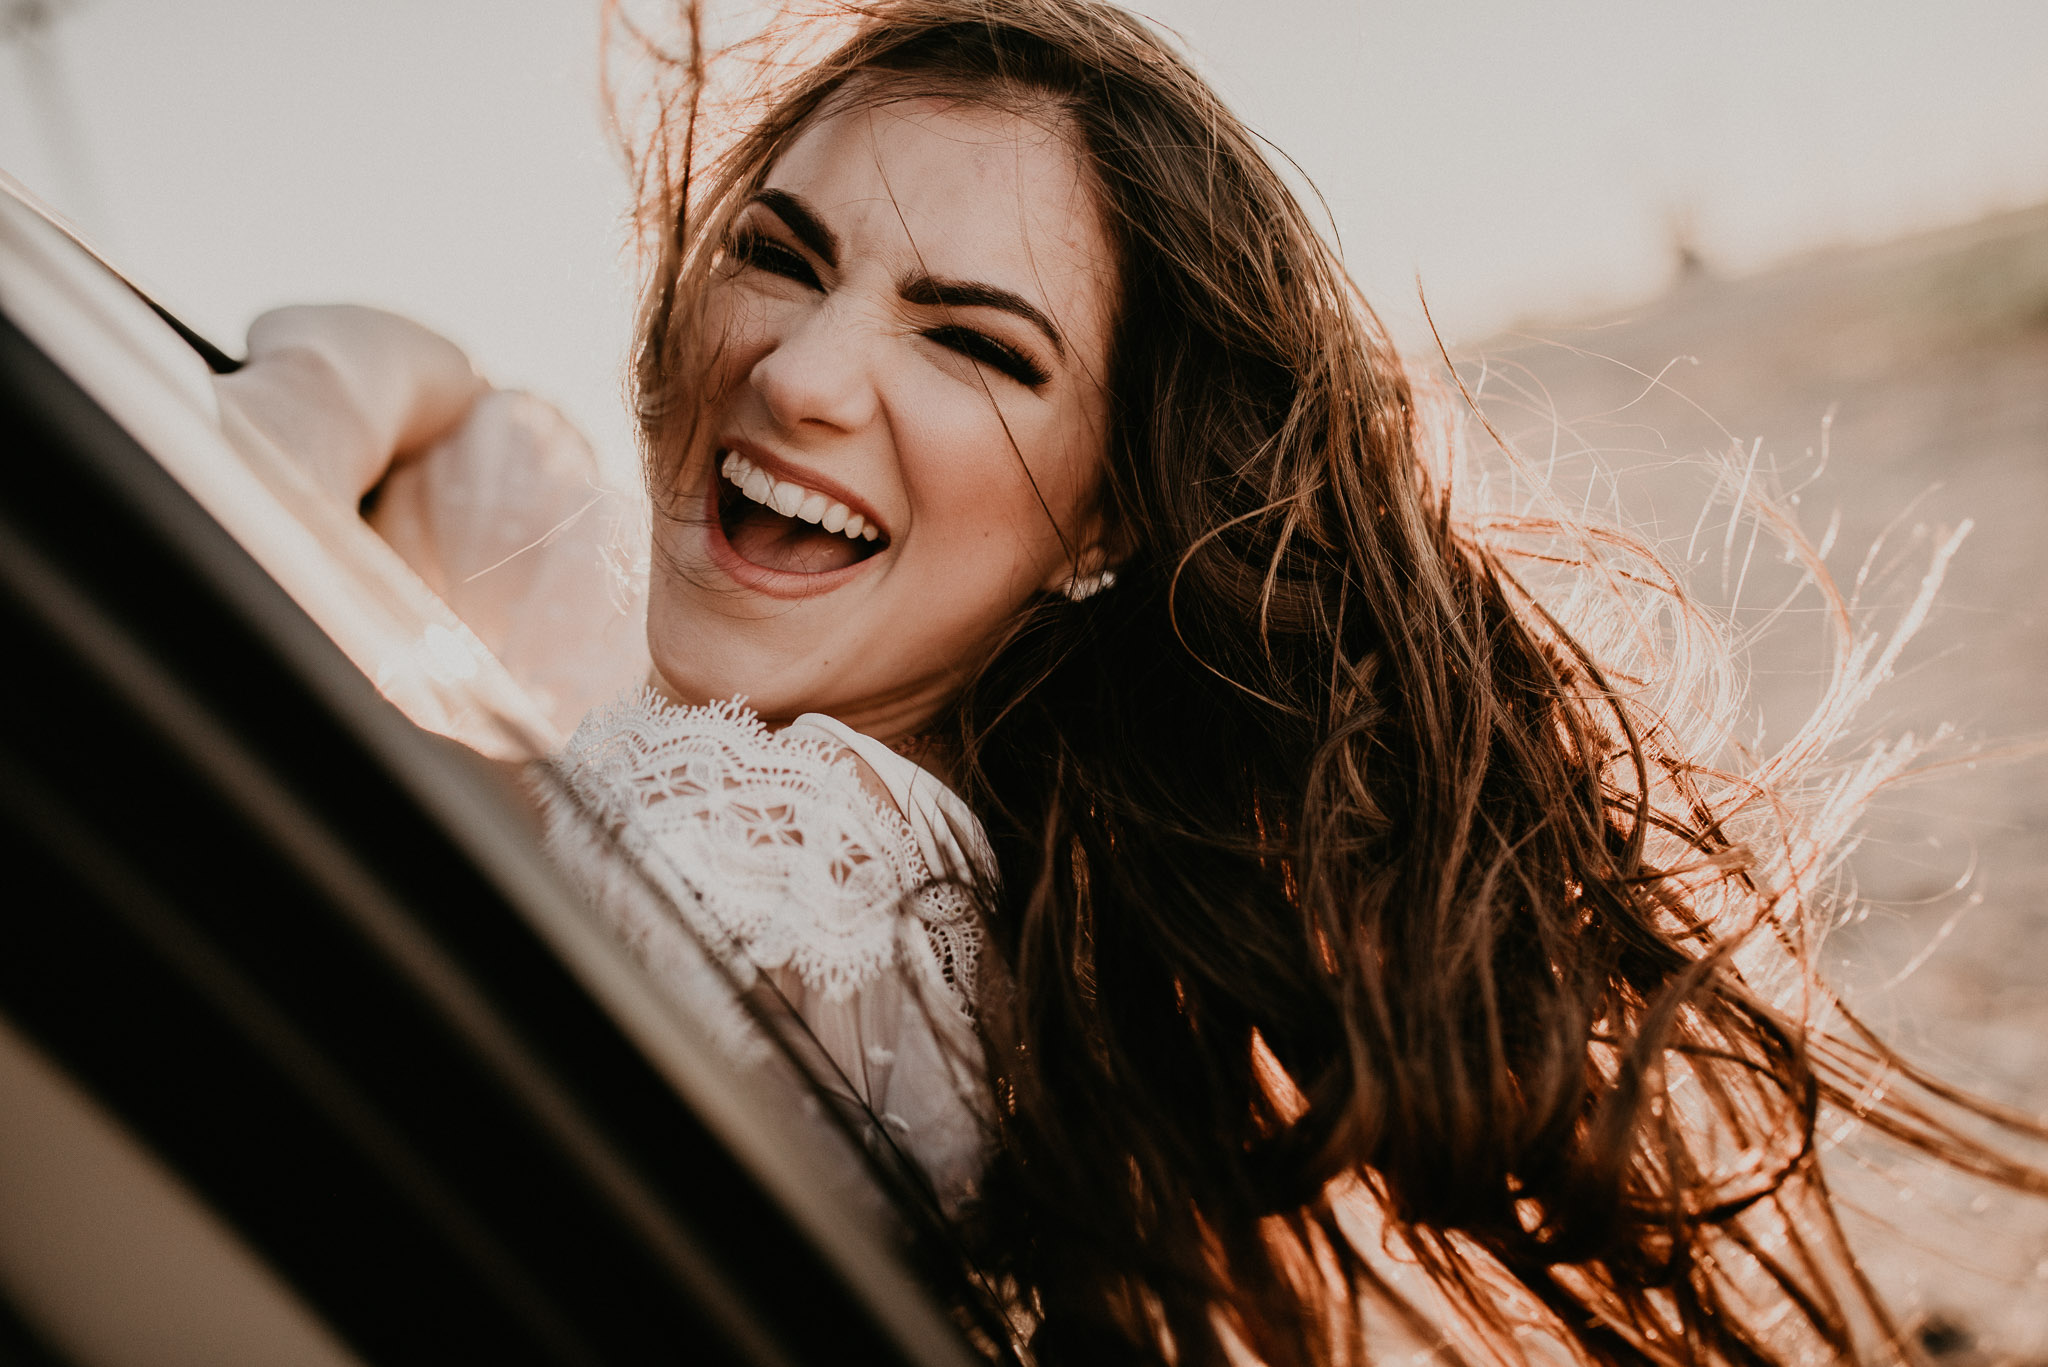 Makayla madden boise senior photographer photography brilliant light meredith laughing nikon canon cameras